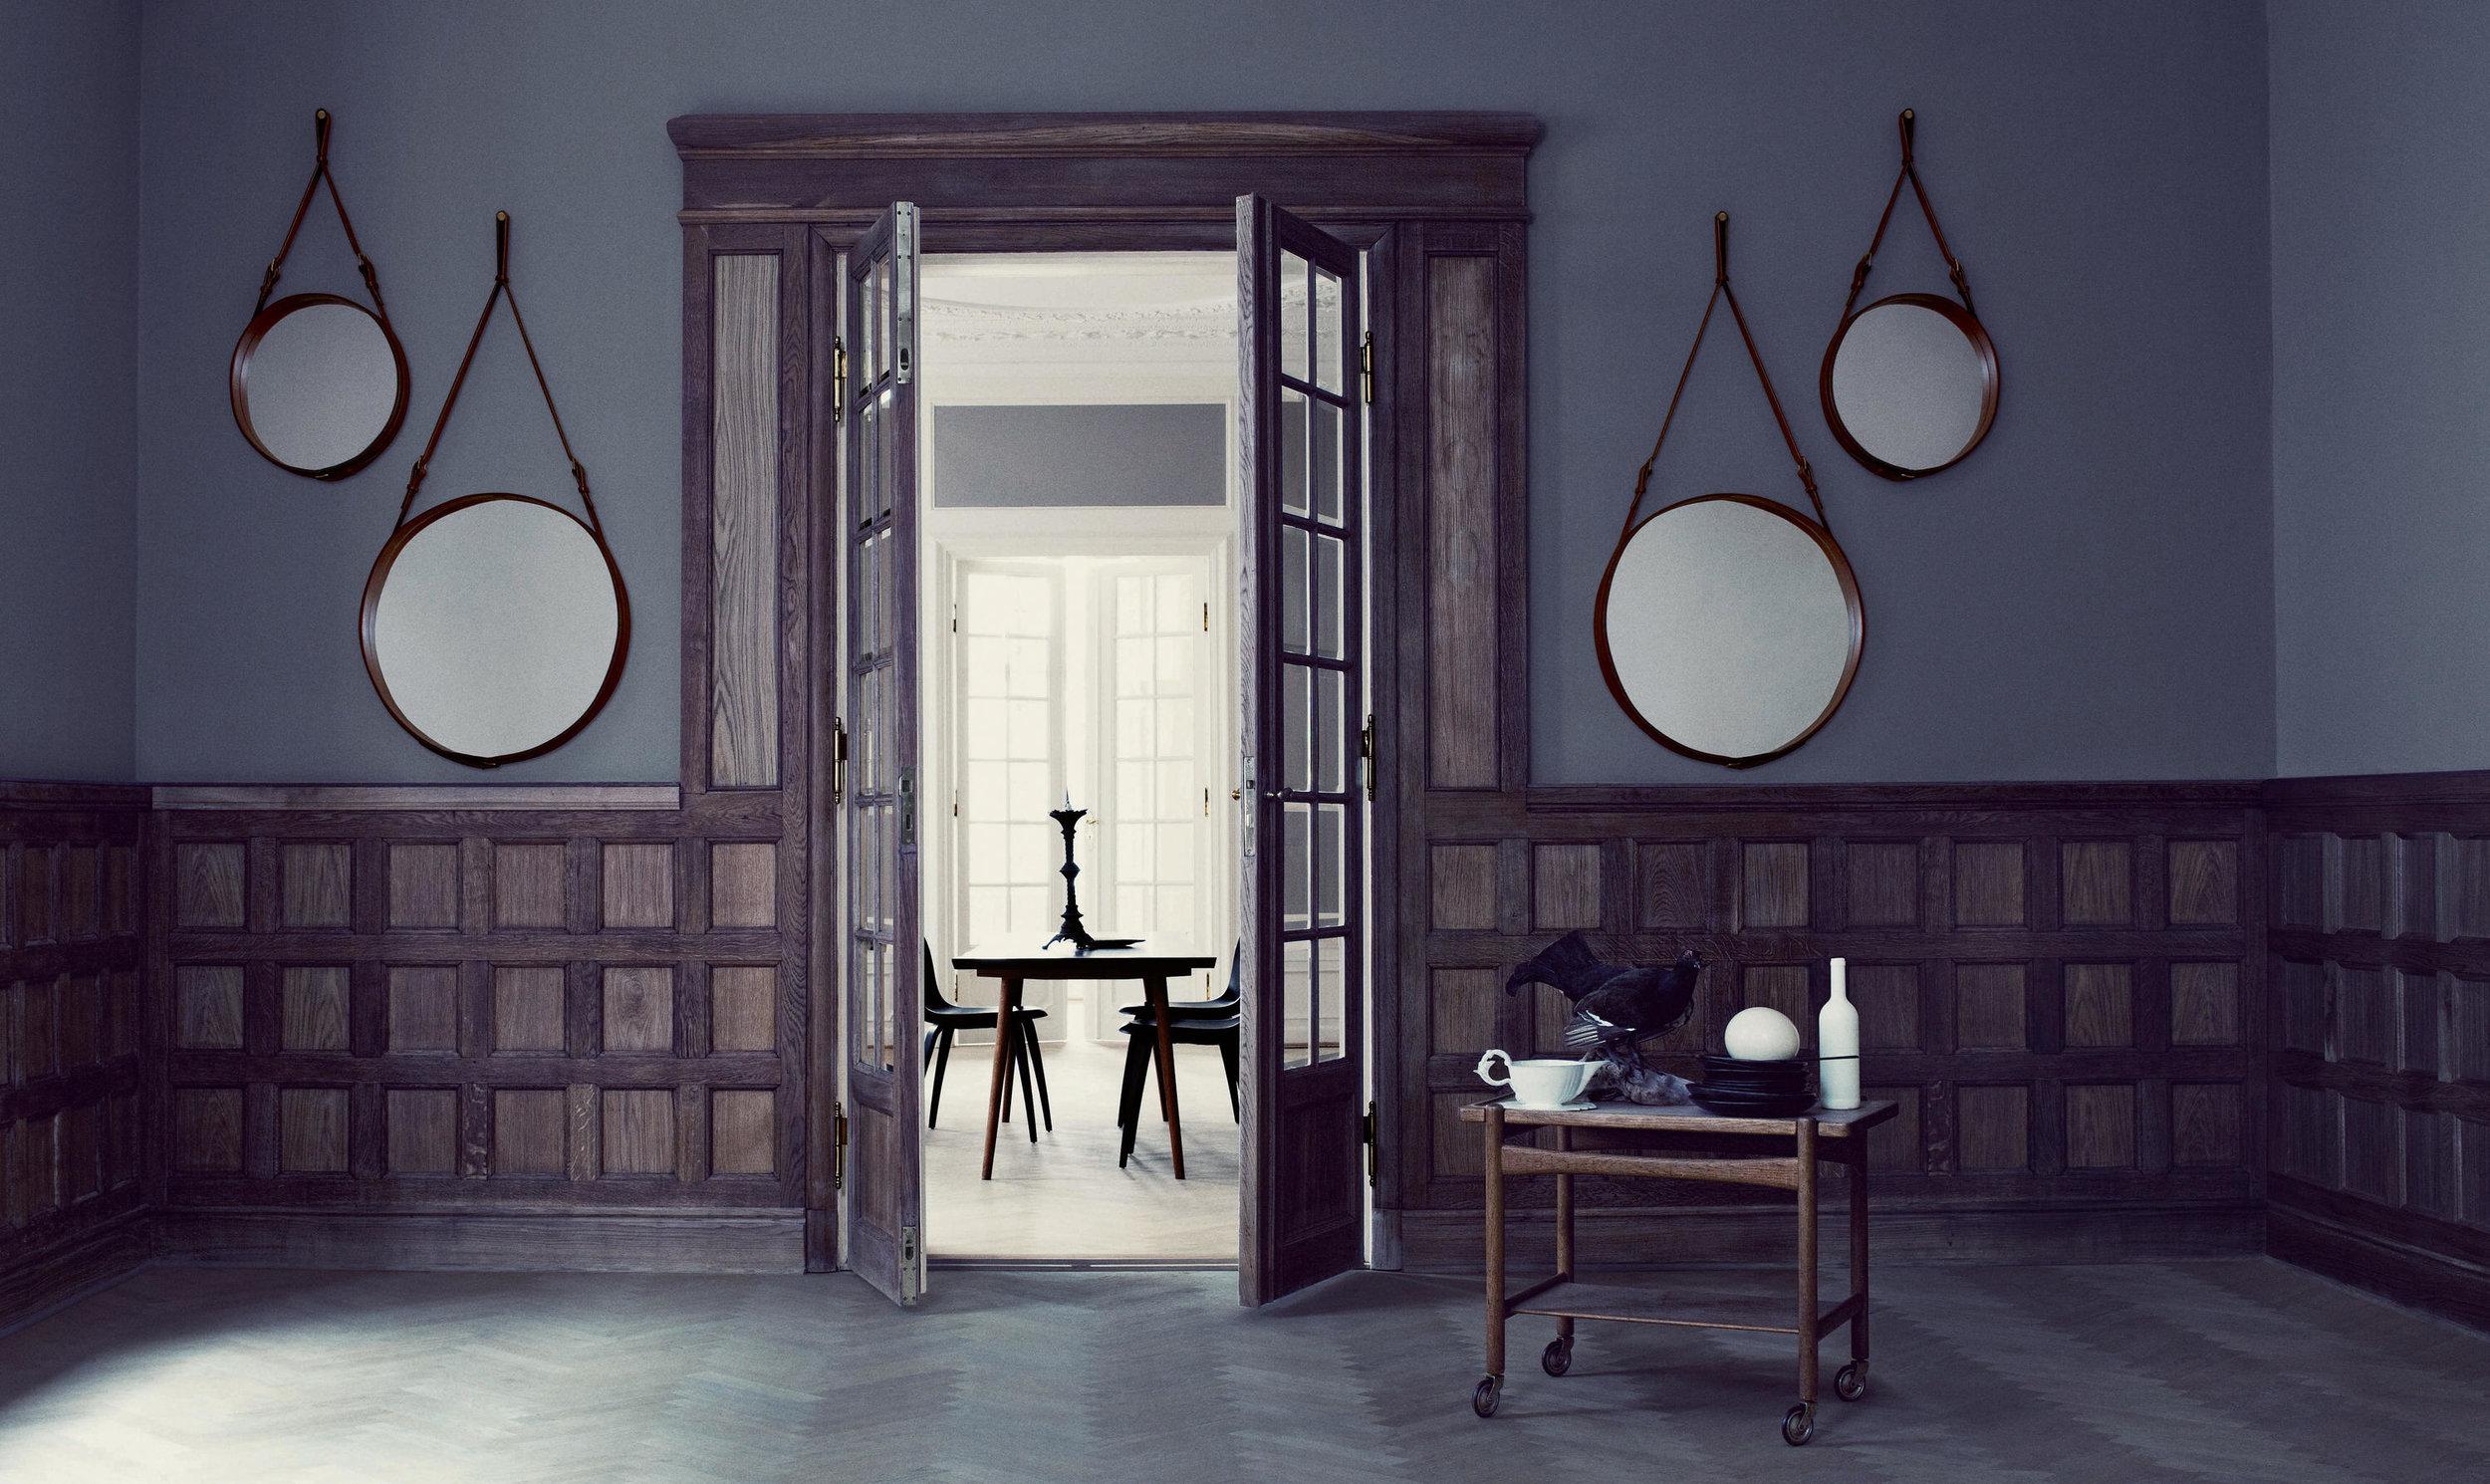 DESIGN_  GUBI.  #Design #Interiors #Adnet #ShowRoom #NordicBrand   https://www.gubi.com